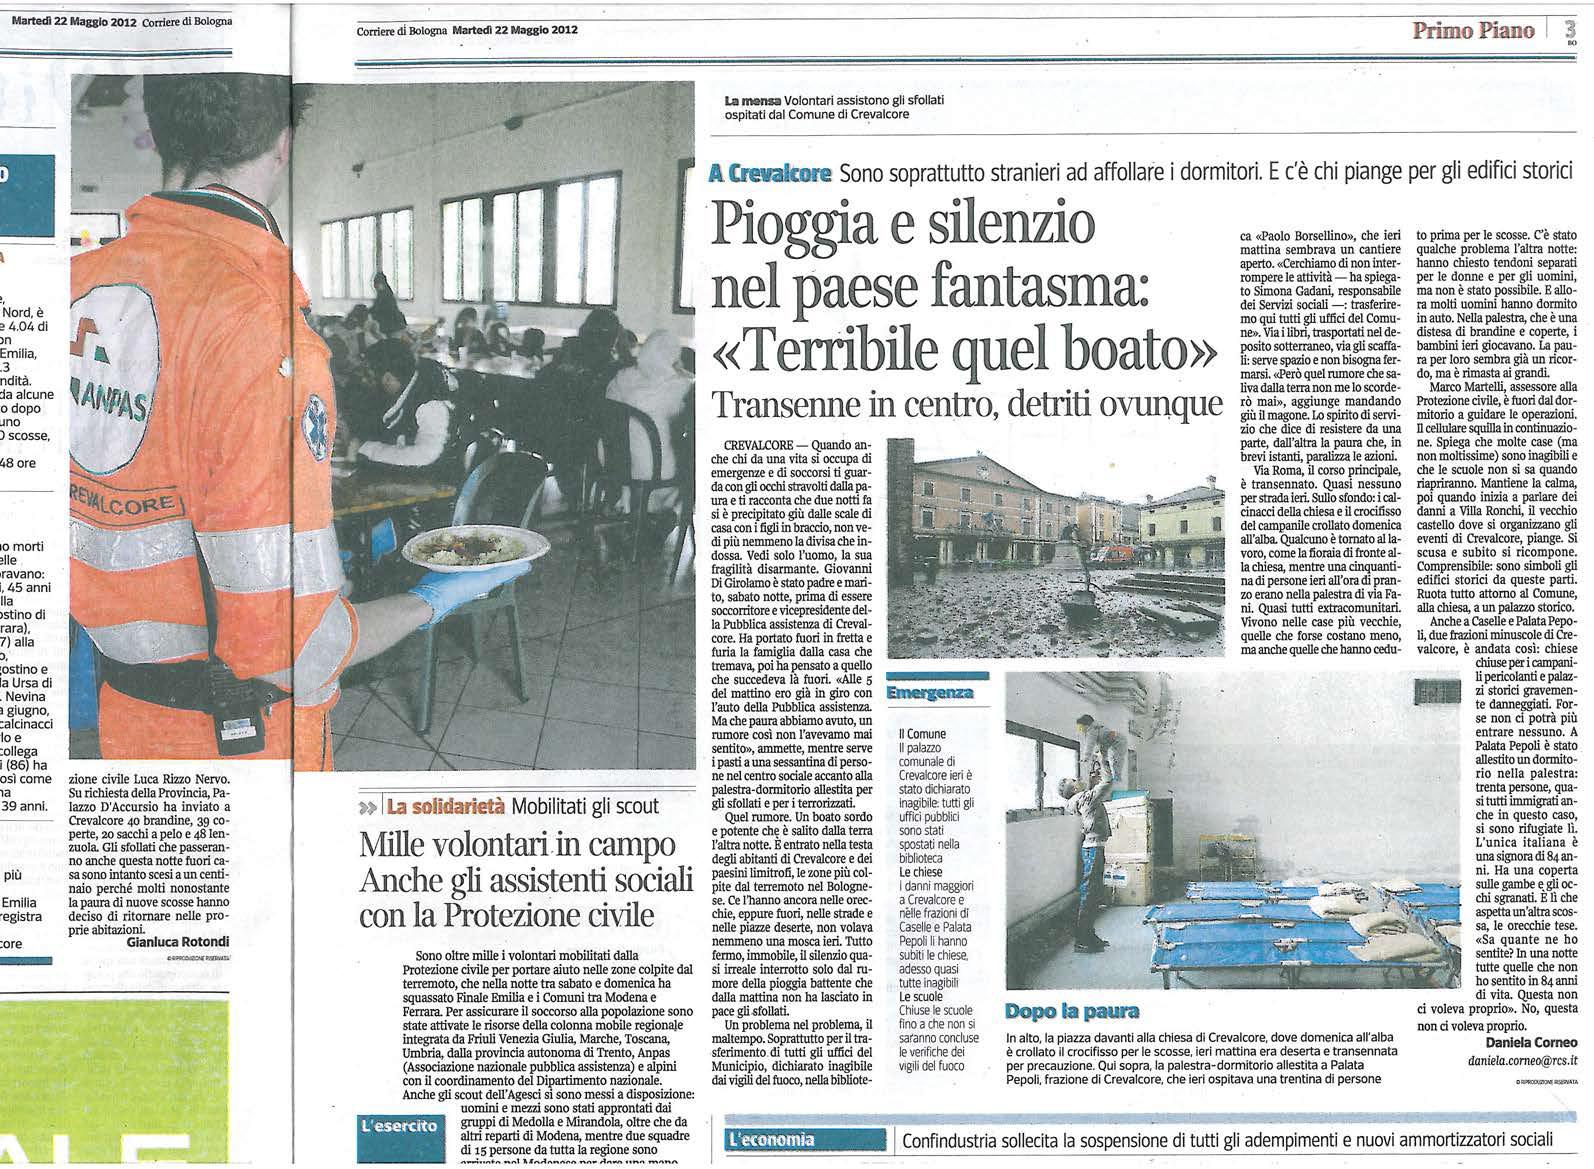 22.05.12corriere_bologna